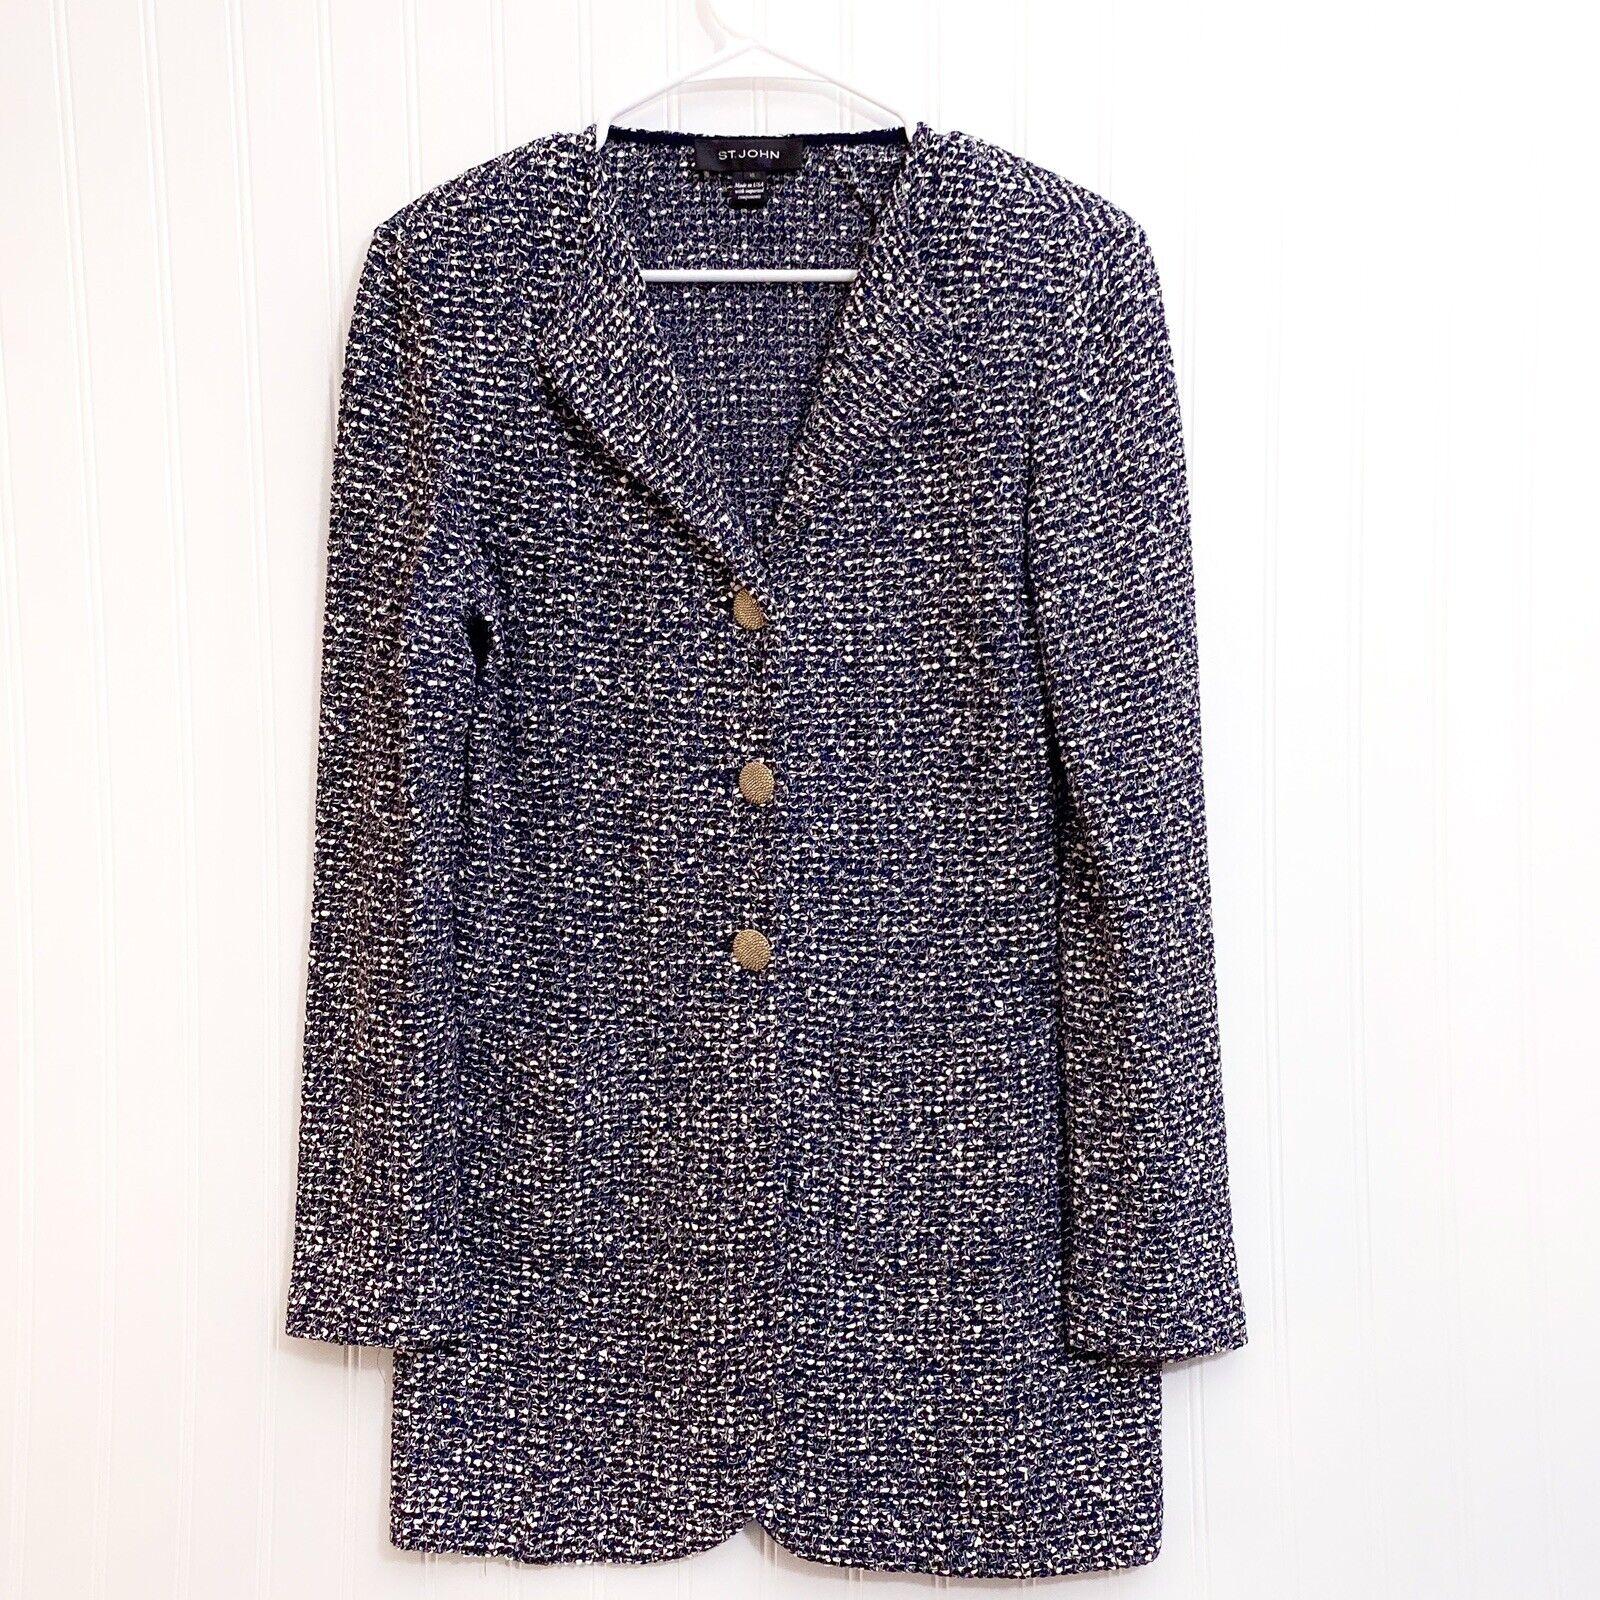 ST. JOHN Textured Tweed Knit Blazer - image 1